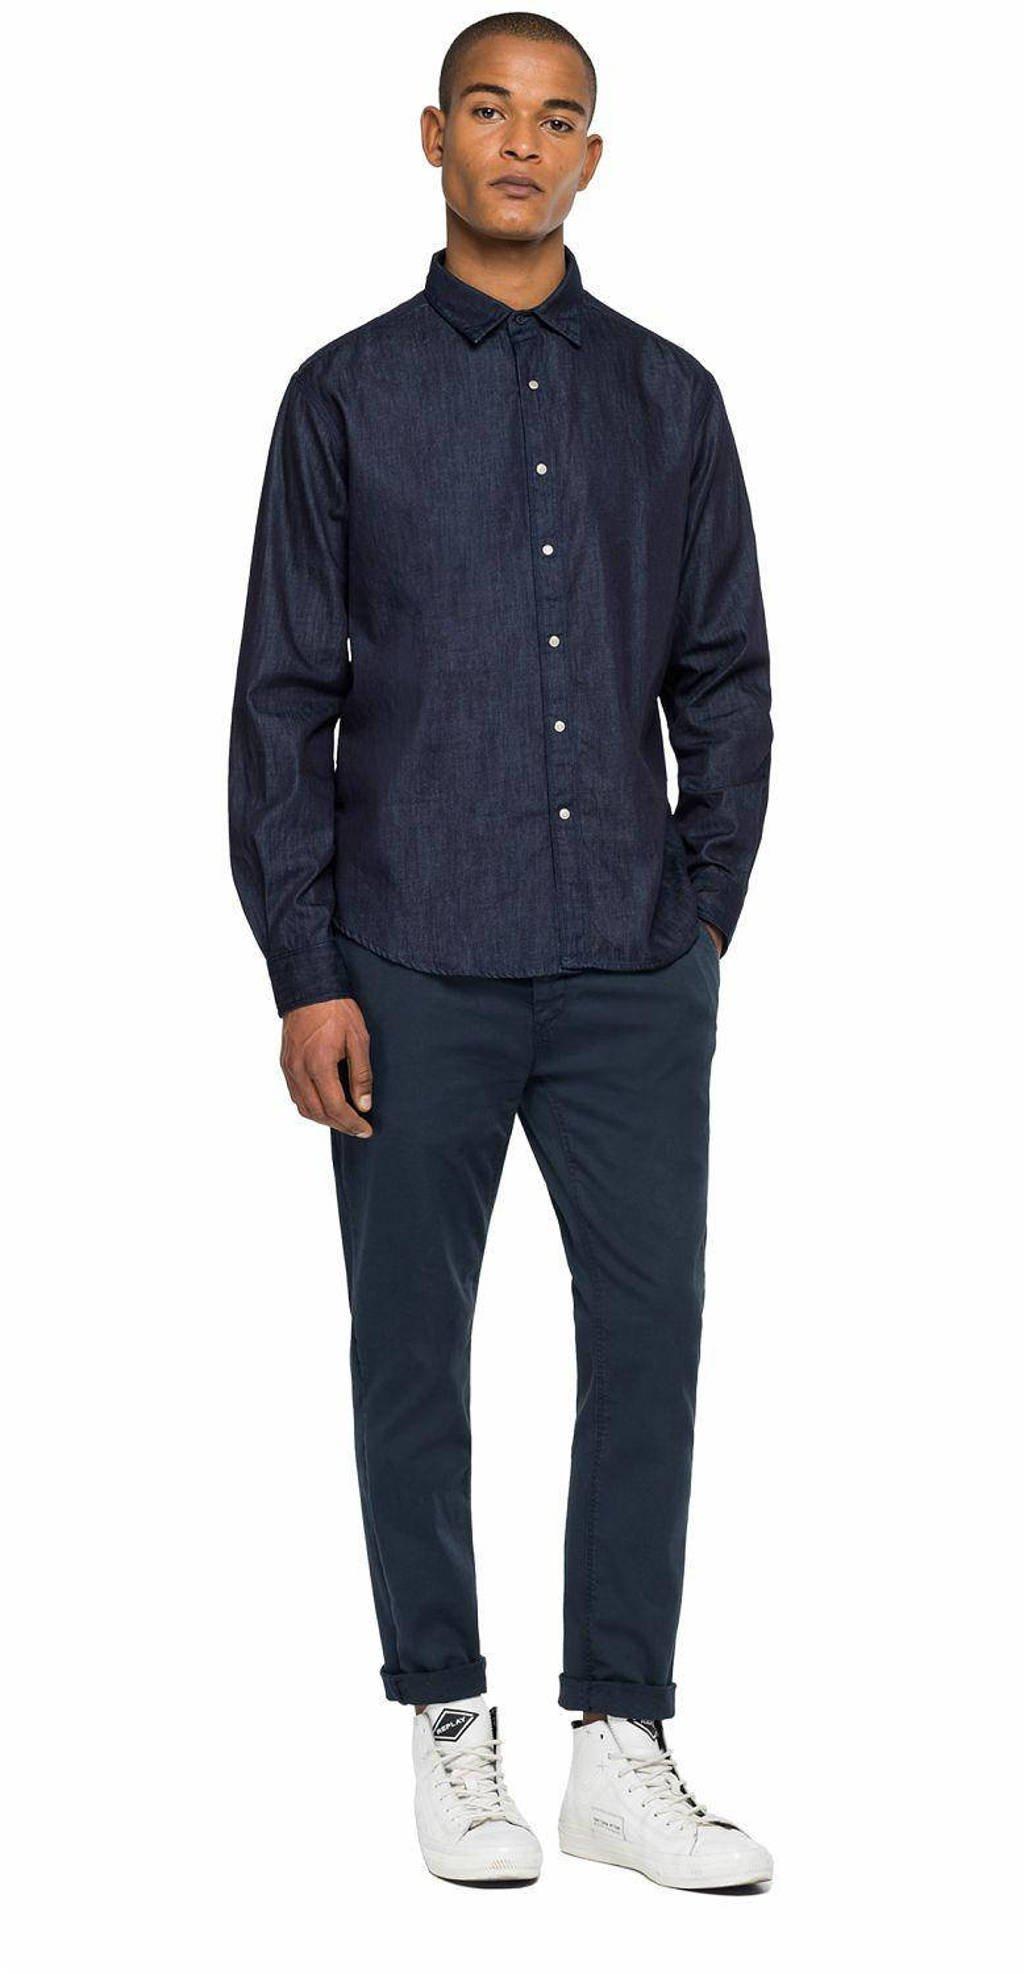 REPLAY regular fit denim overhemd AJAX THEME 007-dark blue, 007-DARK BLUE